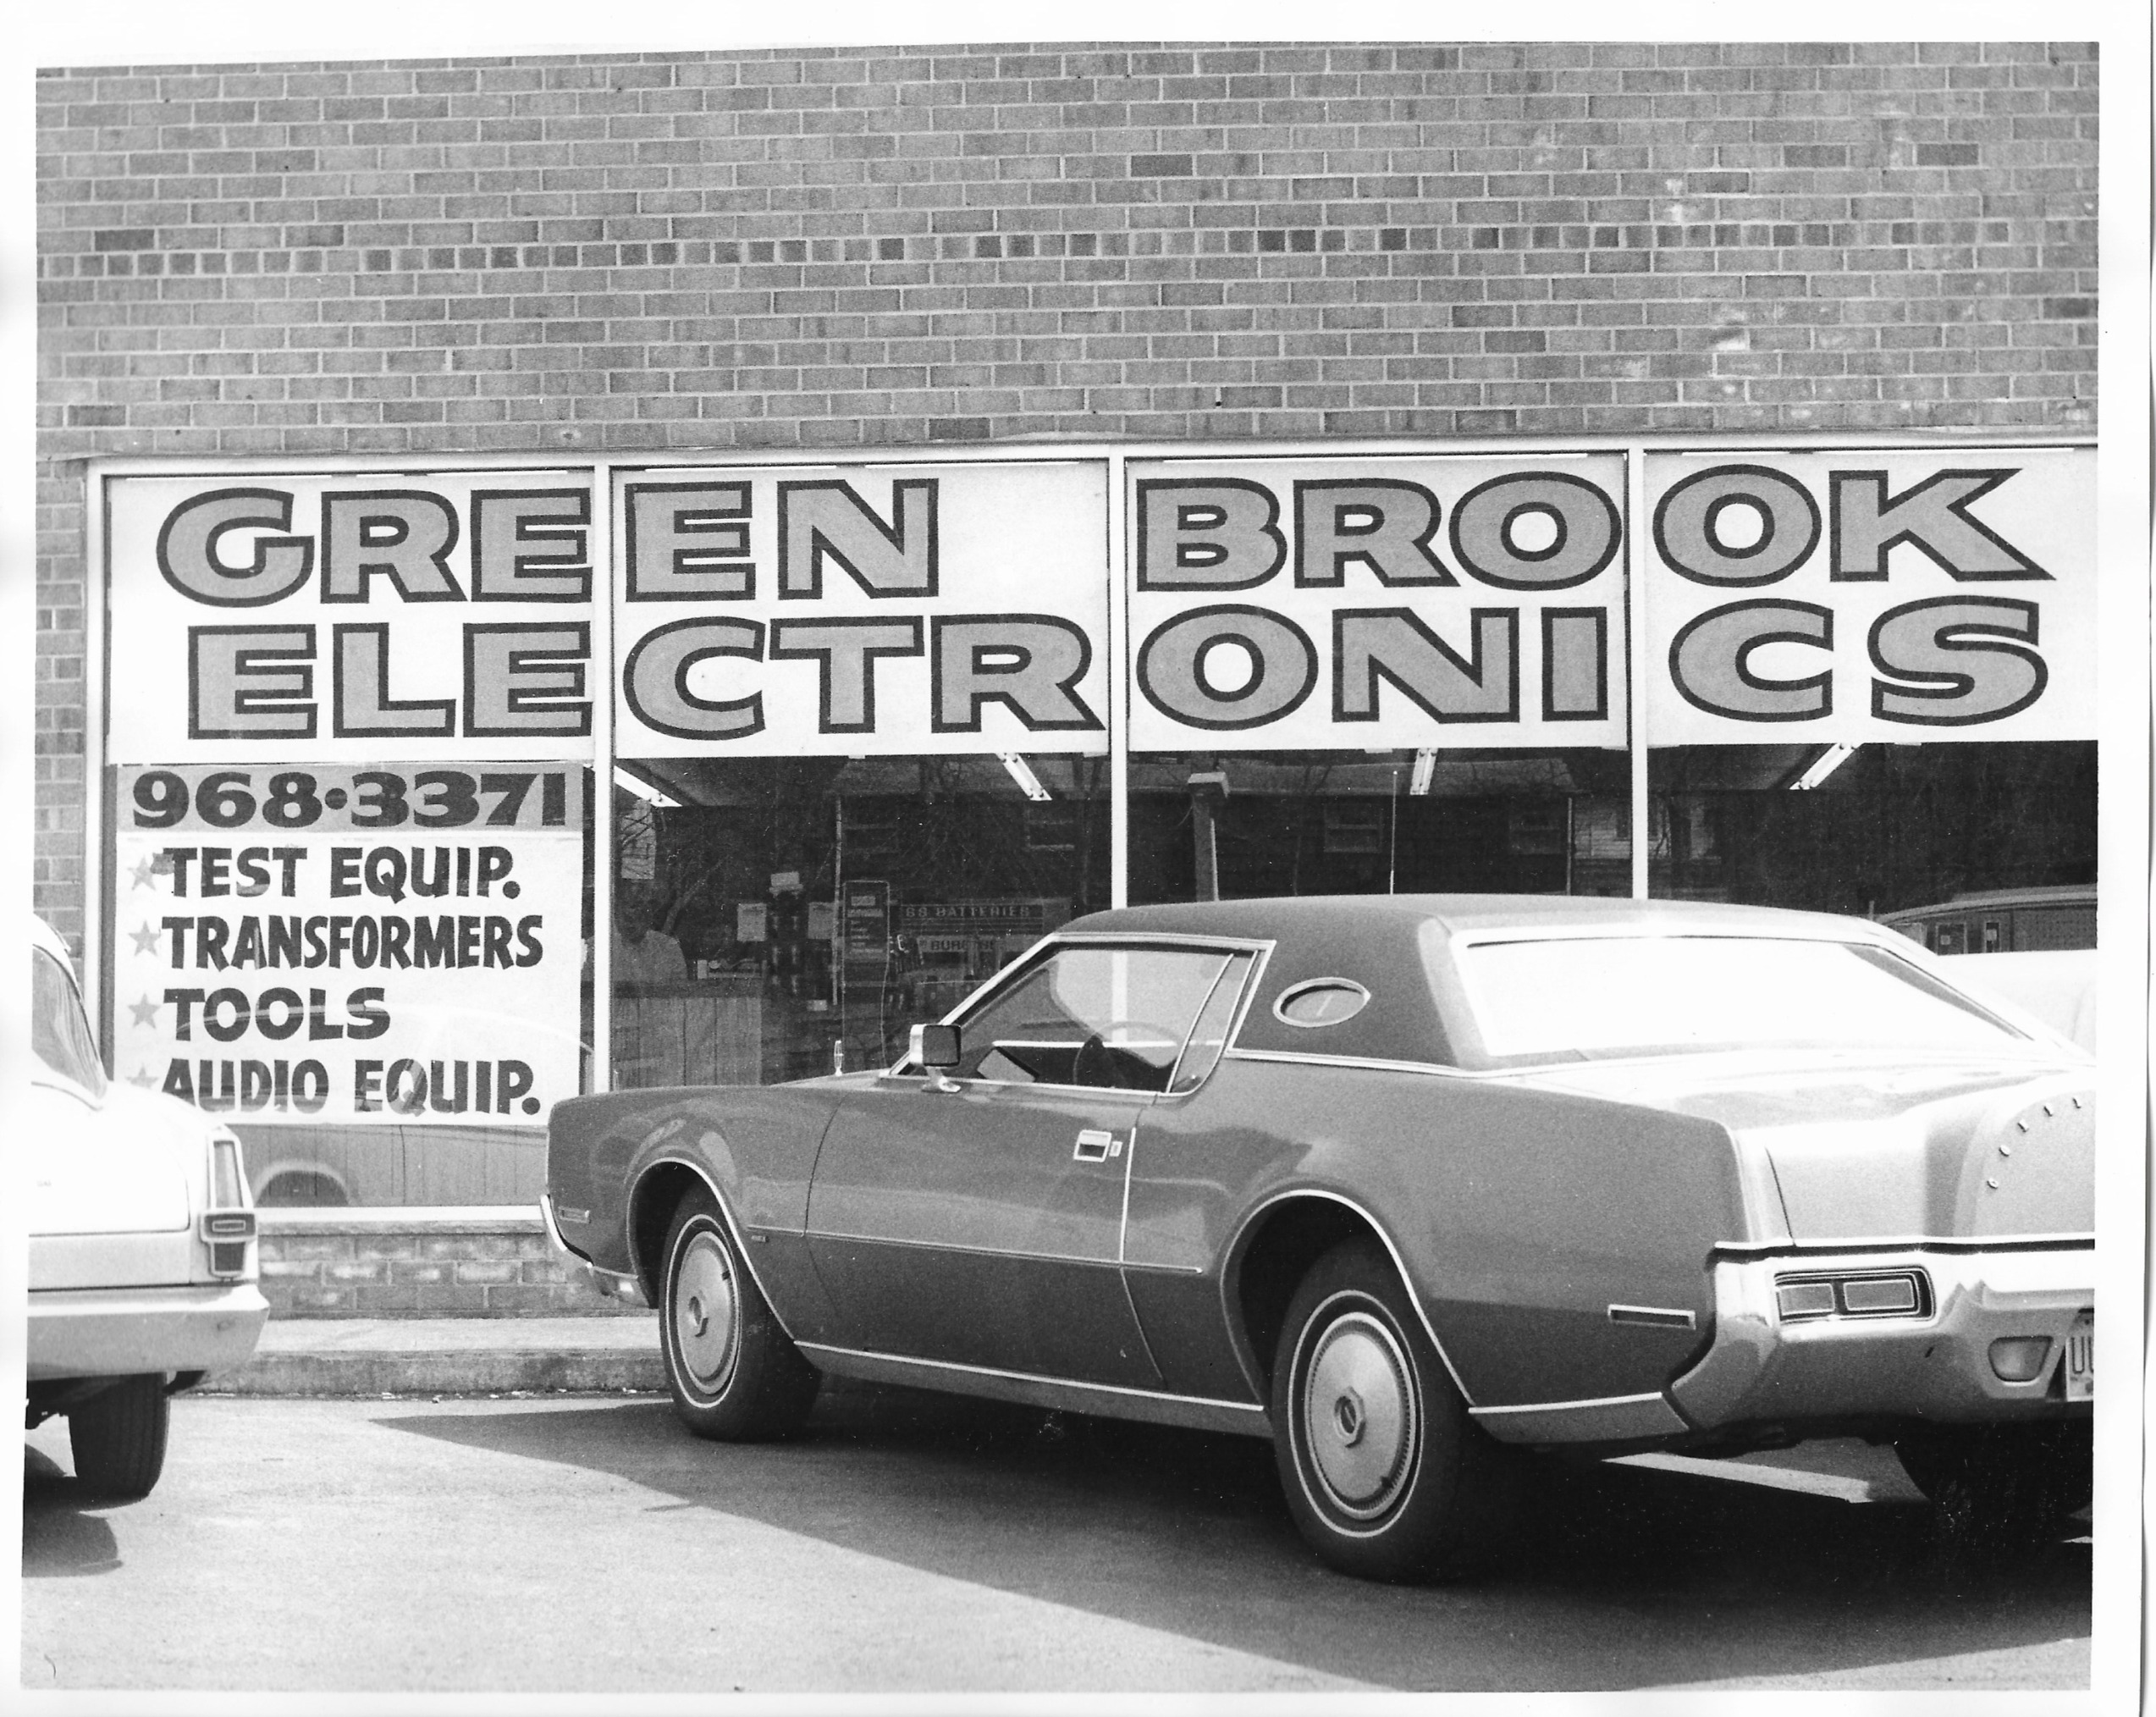 Green Brook Electronics 1974